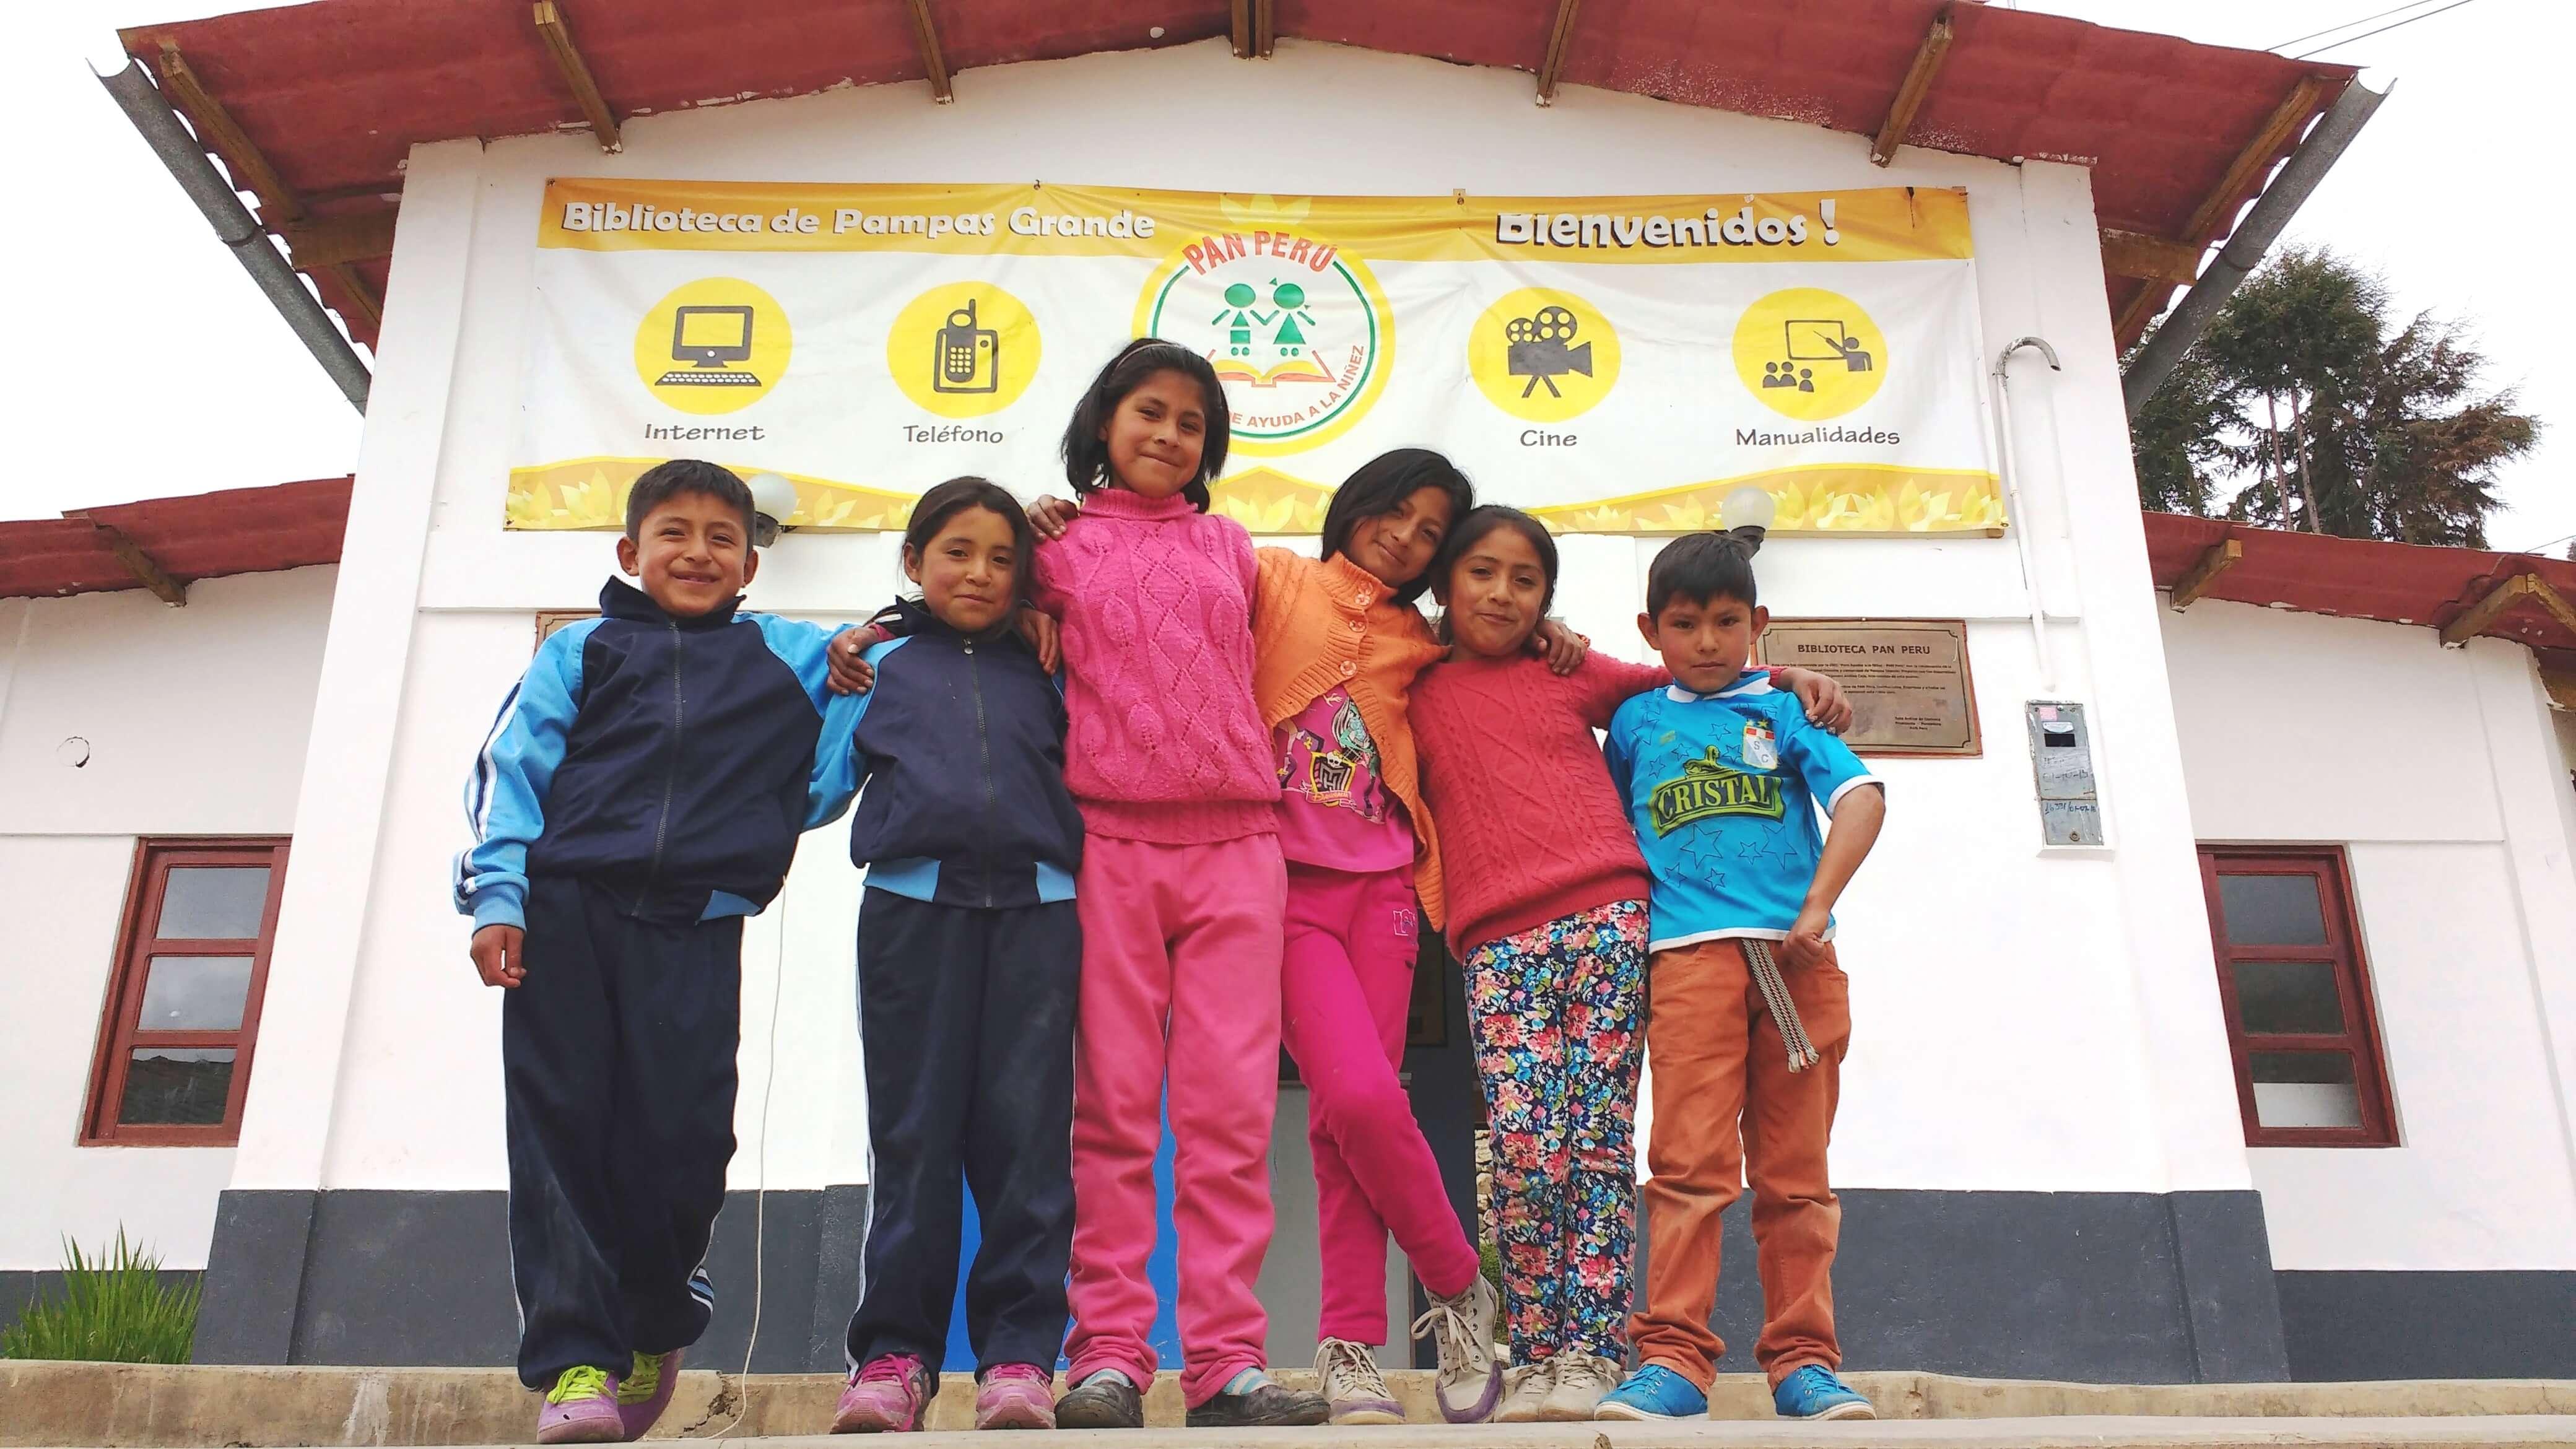 Rural Entrepreneur: The legacy of my Peruvian grandfather